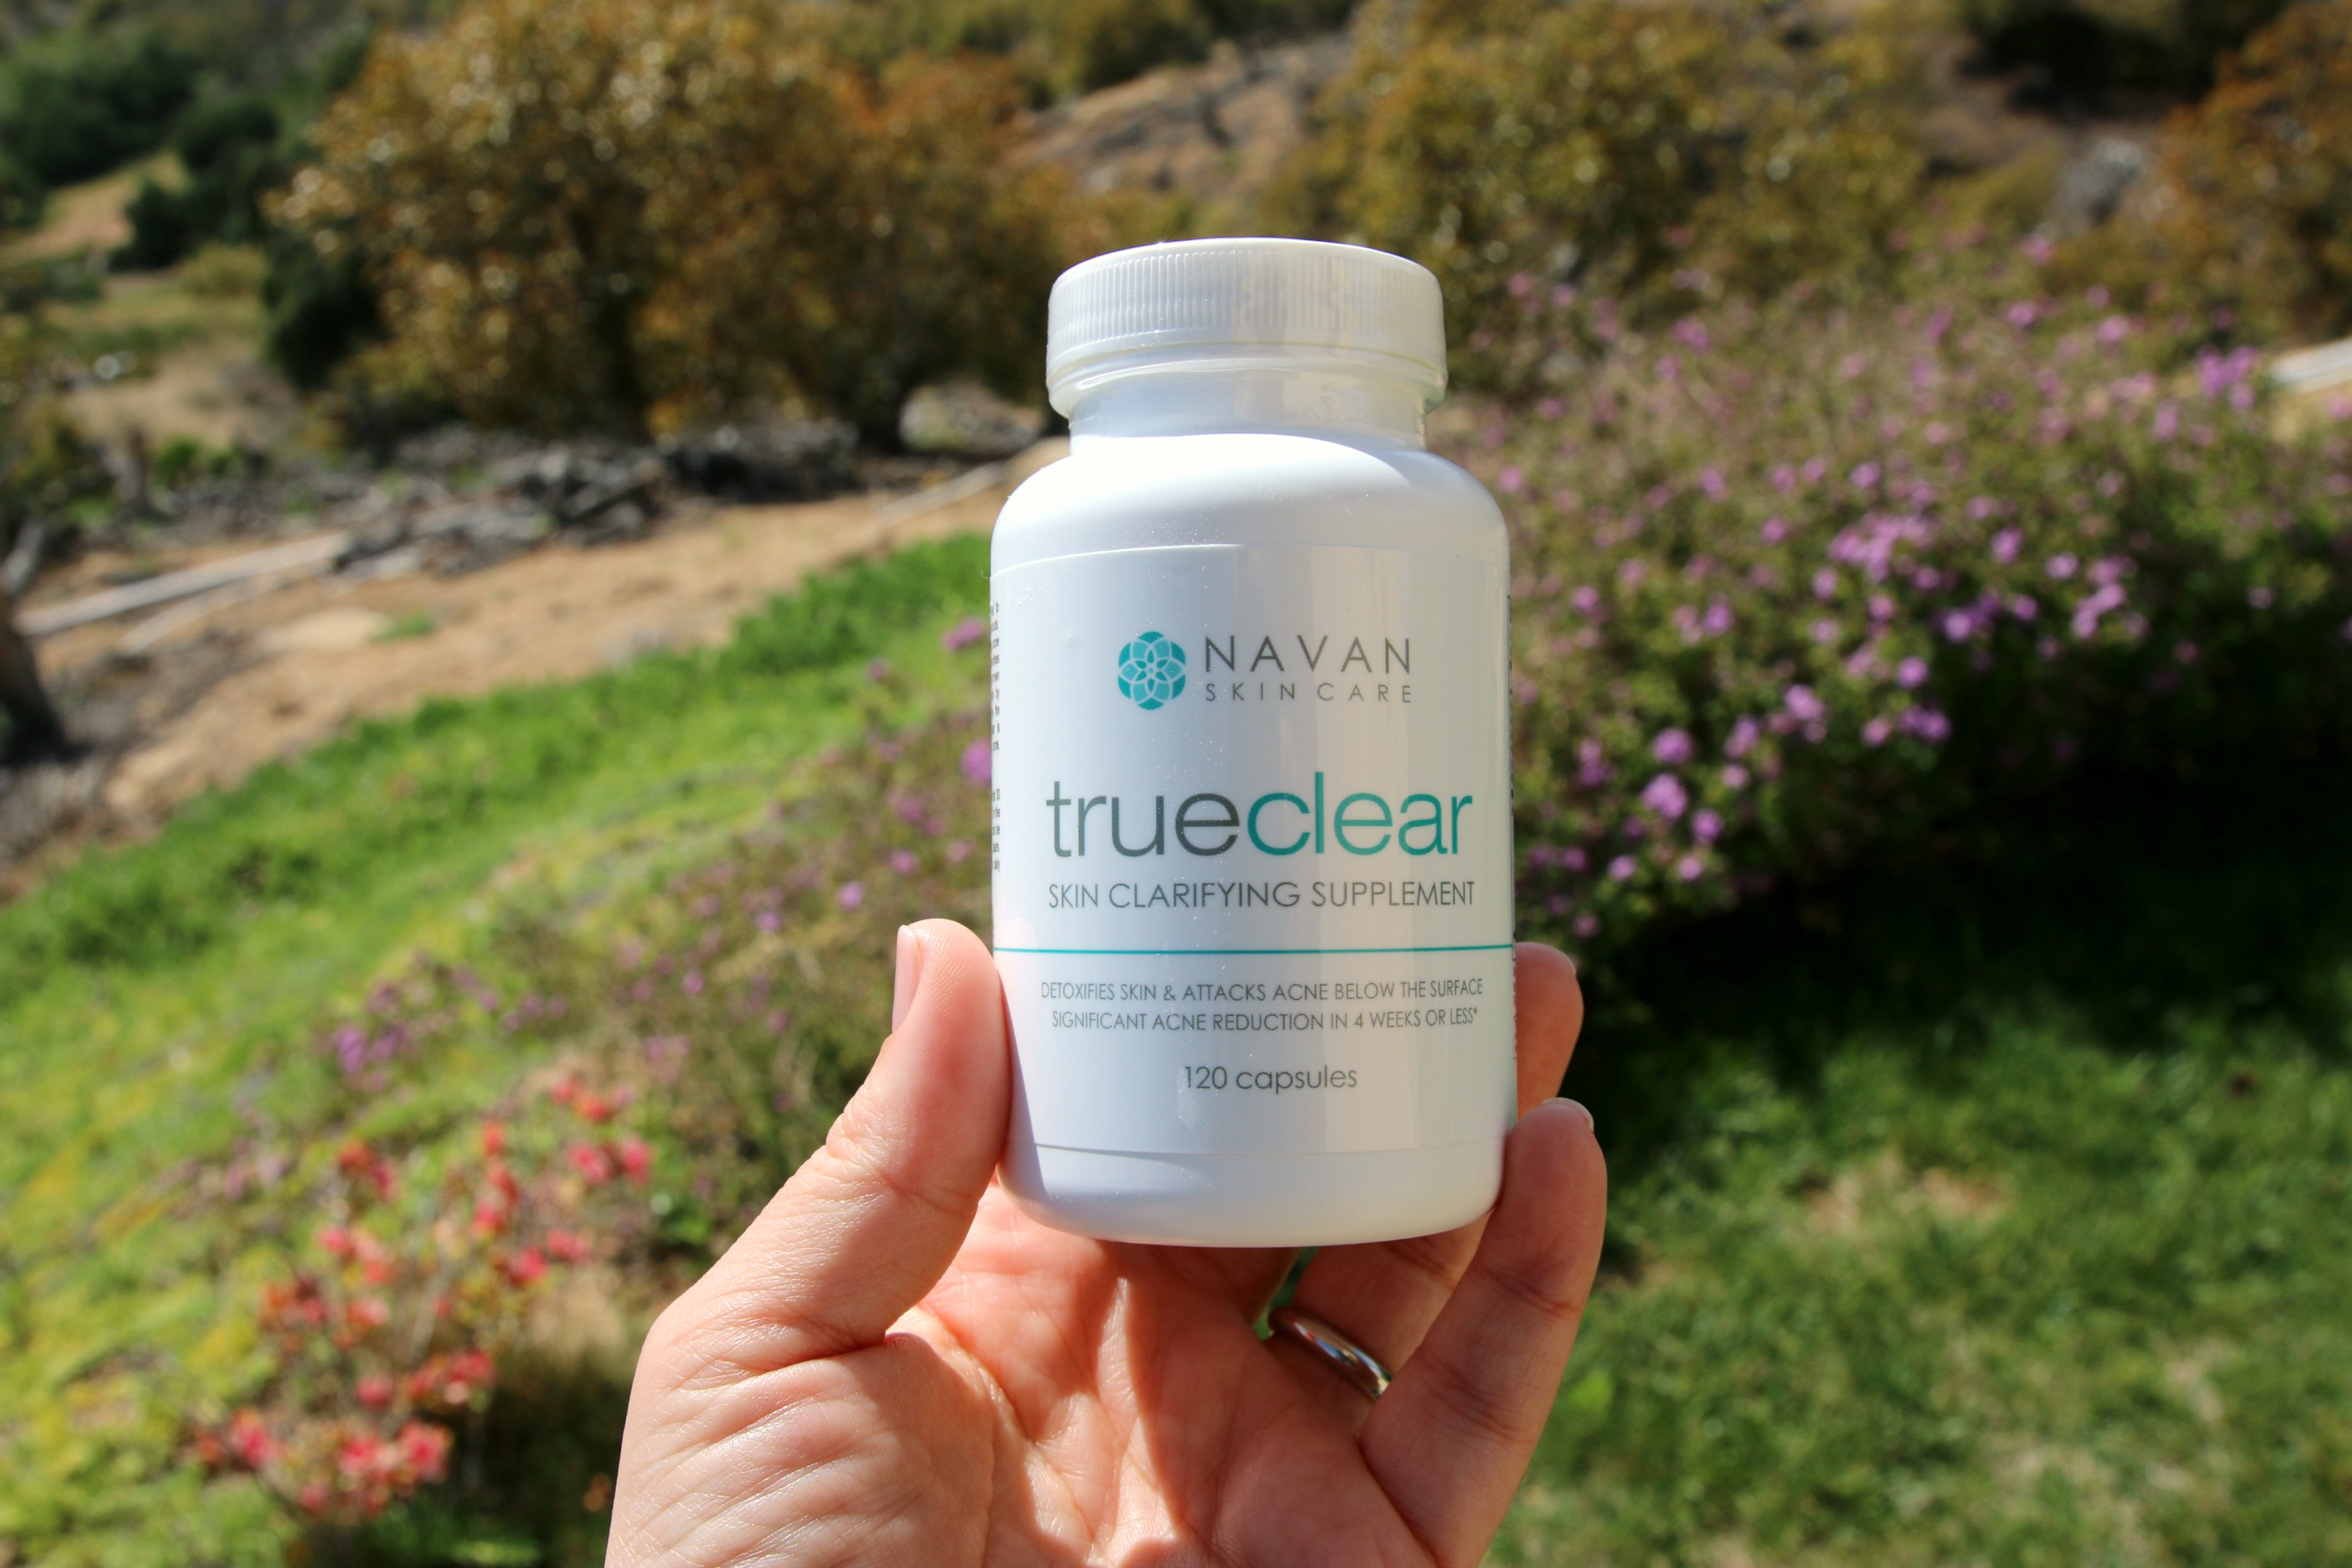 trueclear skin clarifying supplement